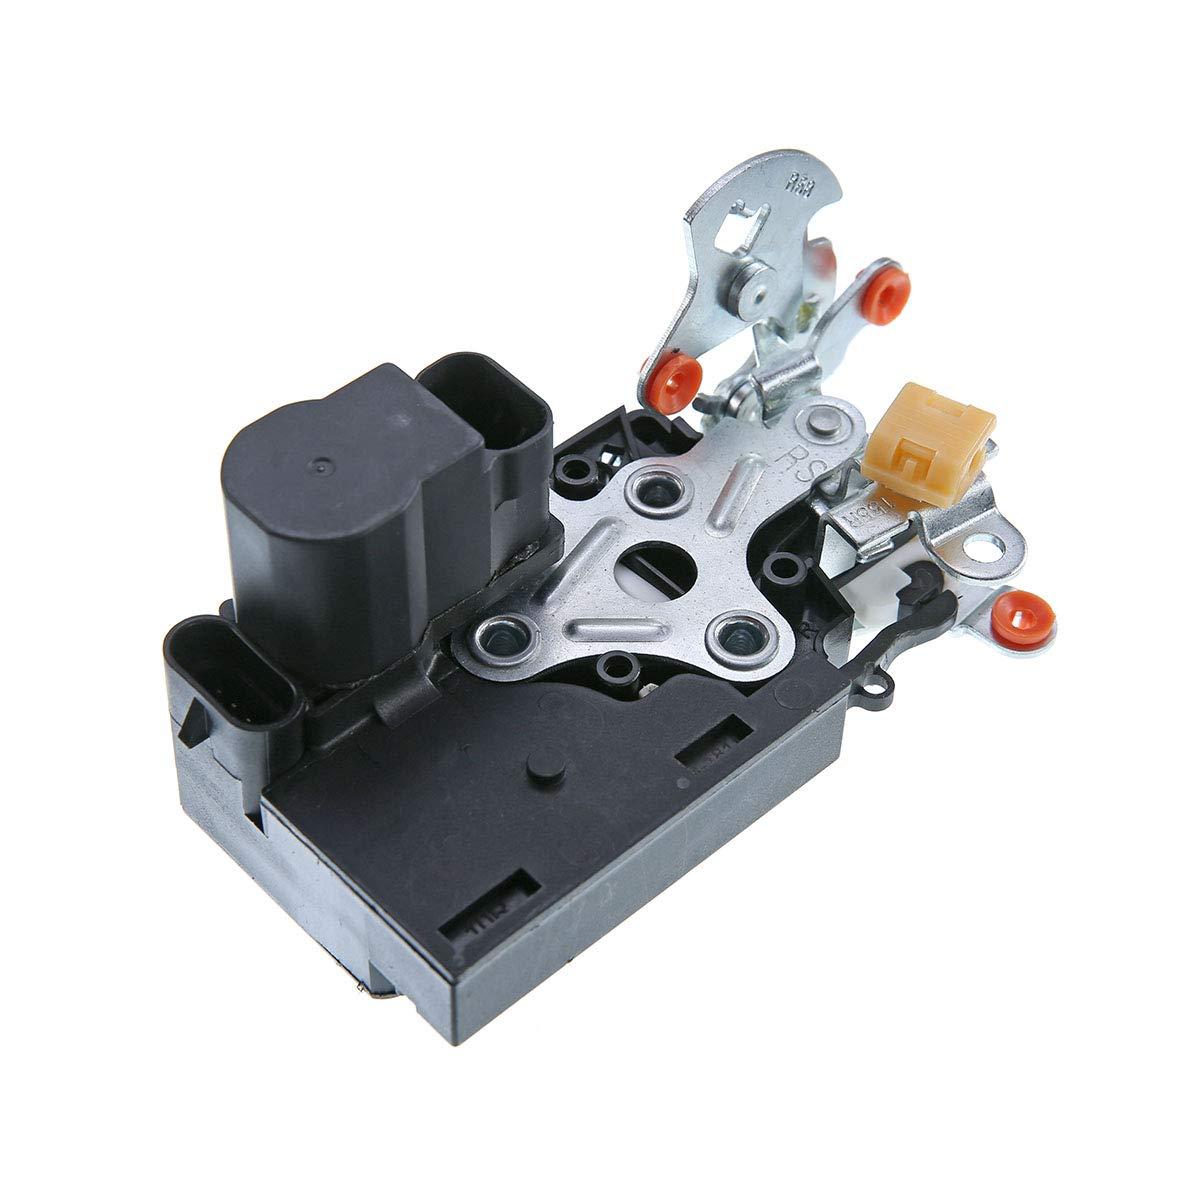 A-Premium Door Lock Actuator Motor for Chevrolet Trailblazer GMC Envoy 2008-2009 Front Right Passenger Side